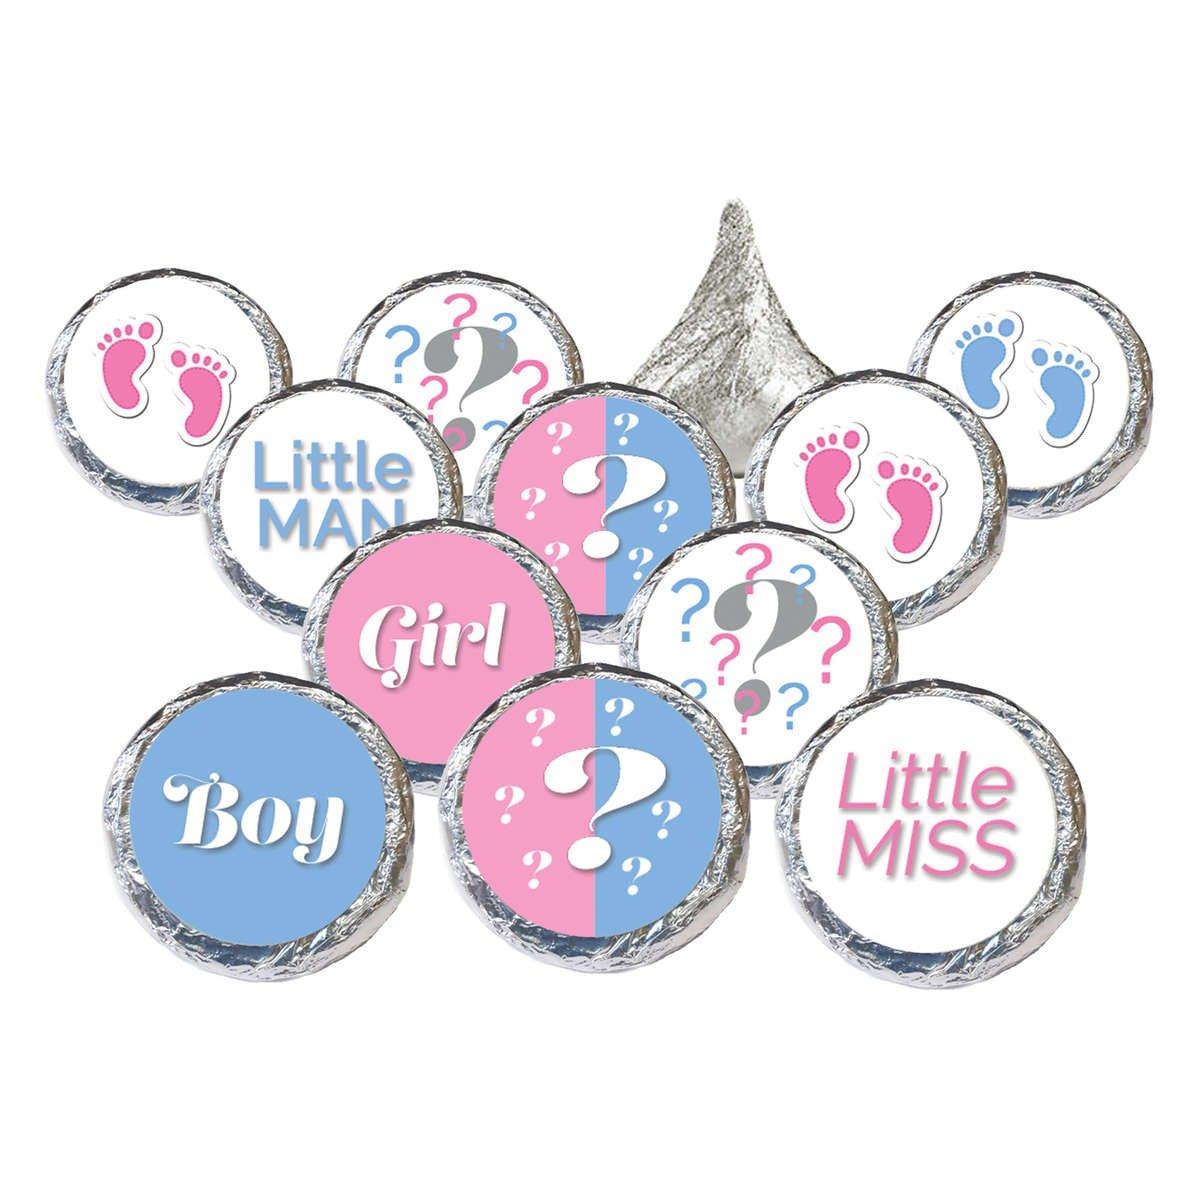 Boy or Girl Baby Gender Reveal